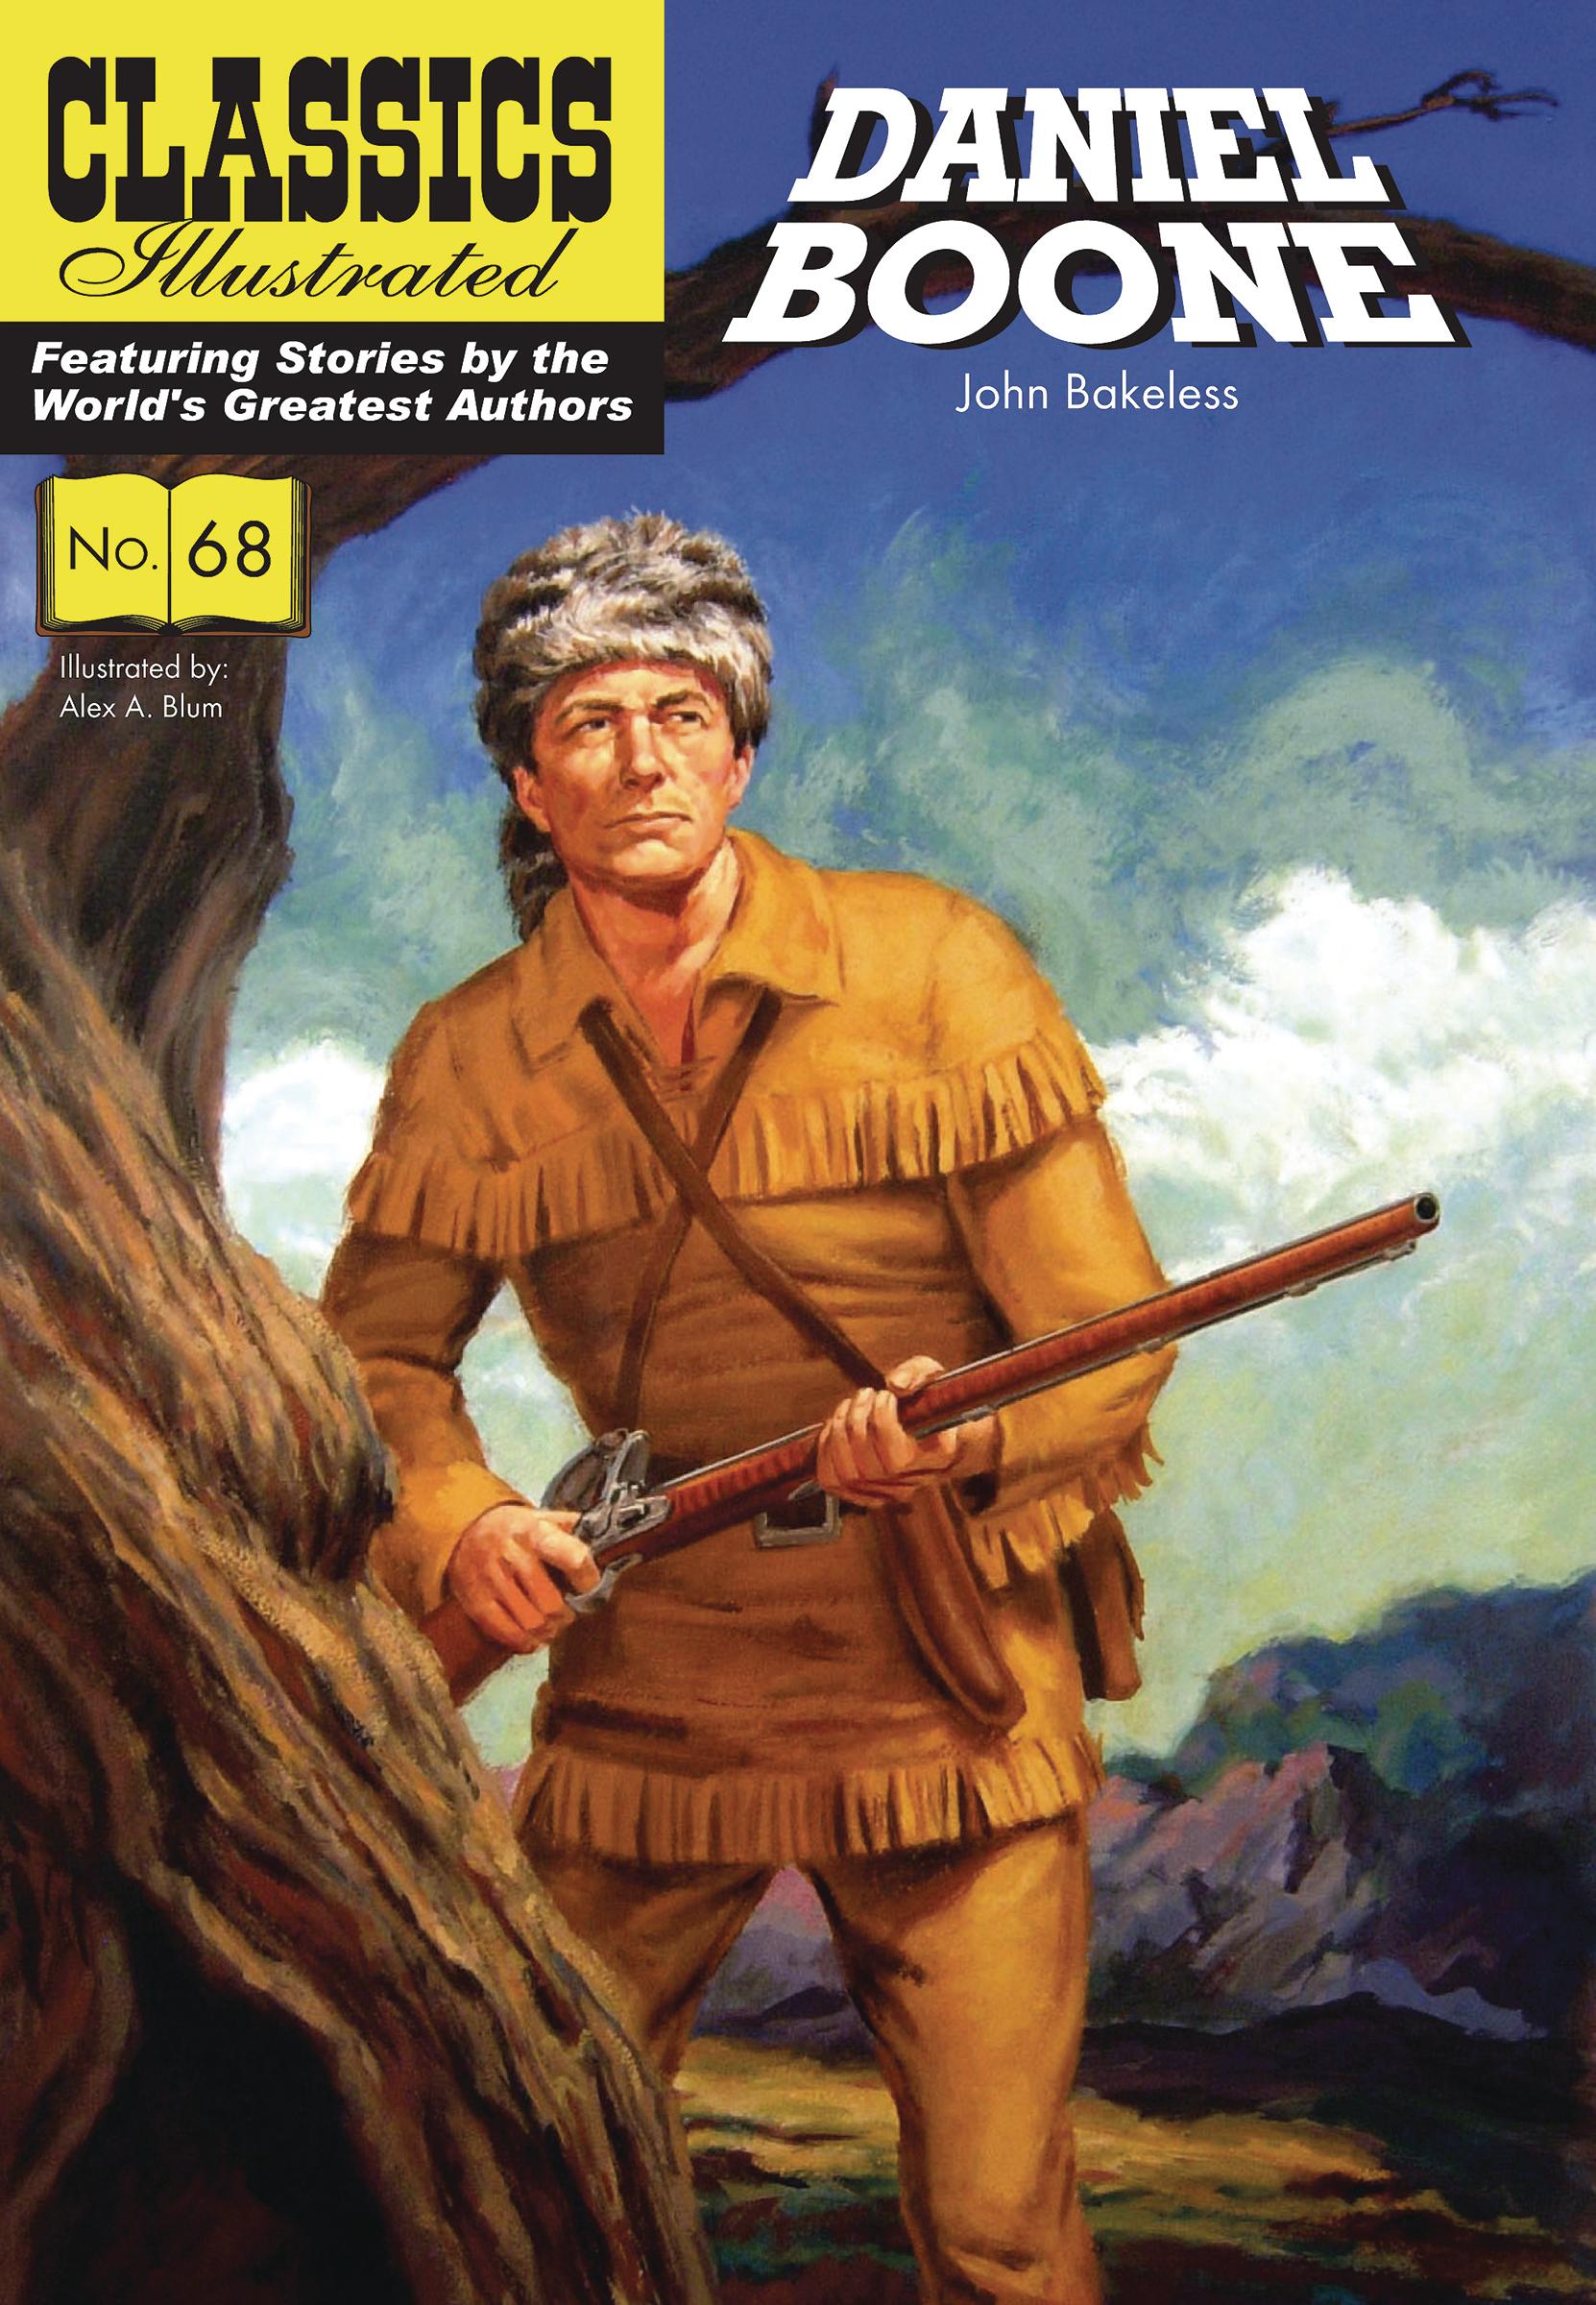 Classic Book Cover Uk ~ Sep classic illustrated tp daniel boone previews